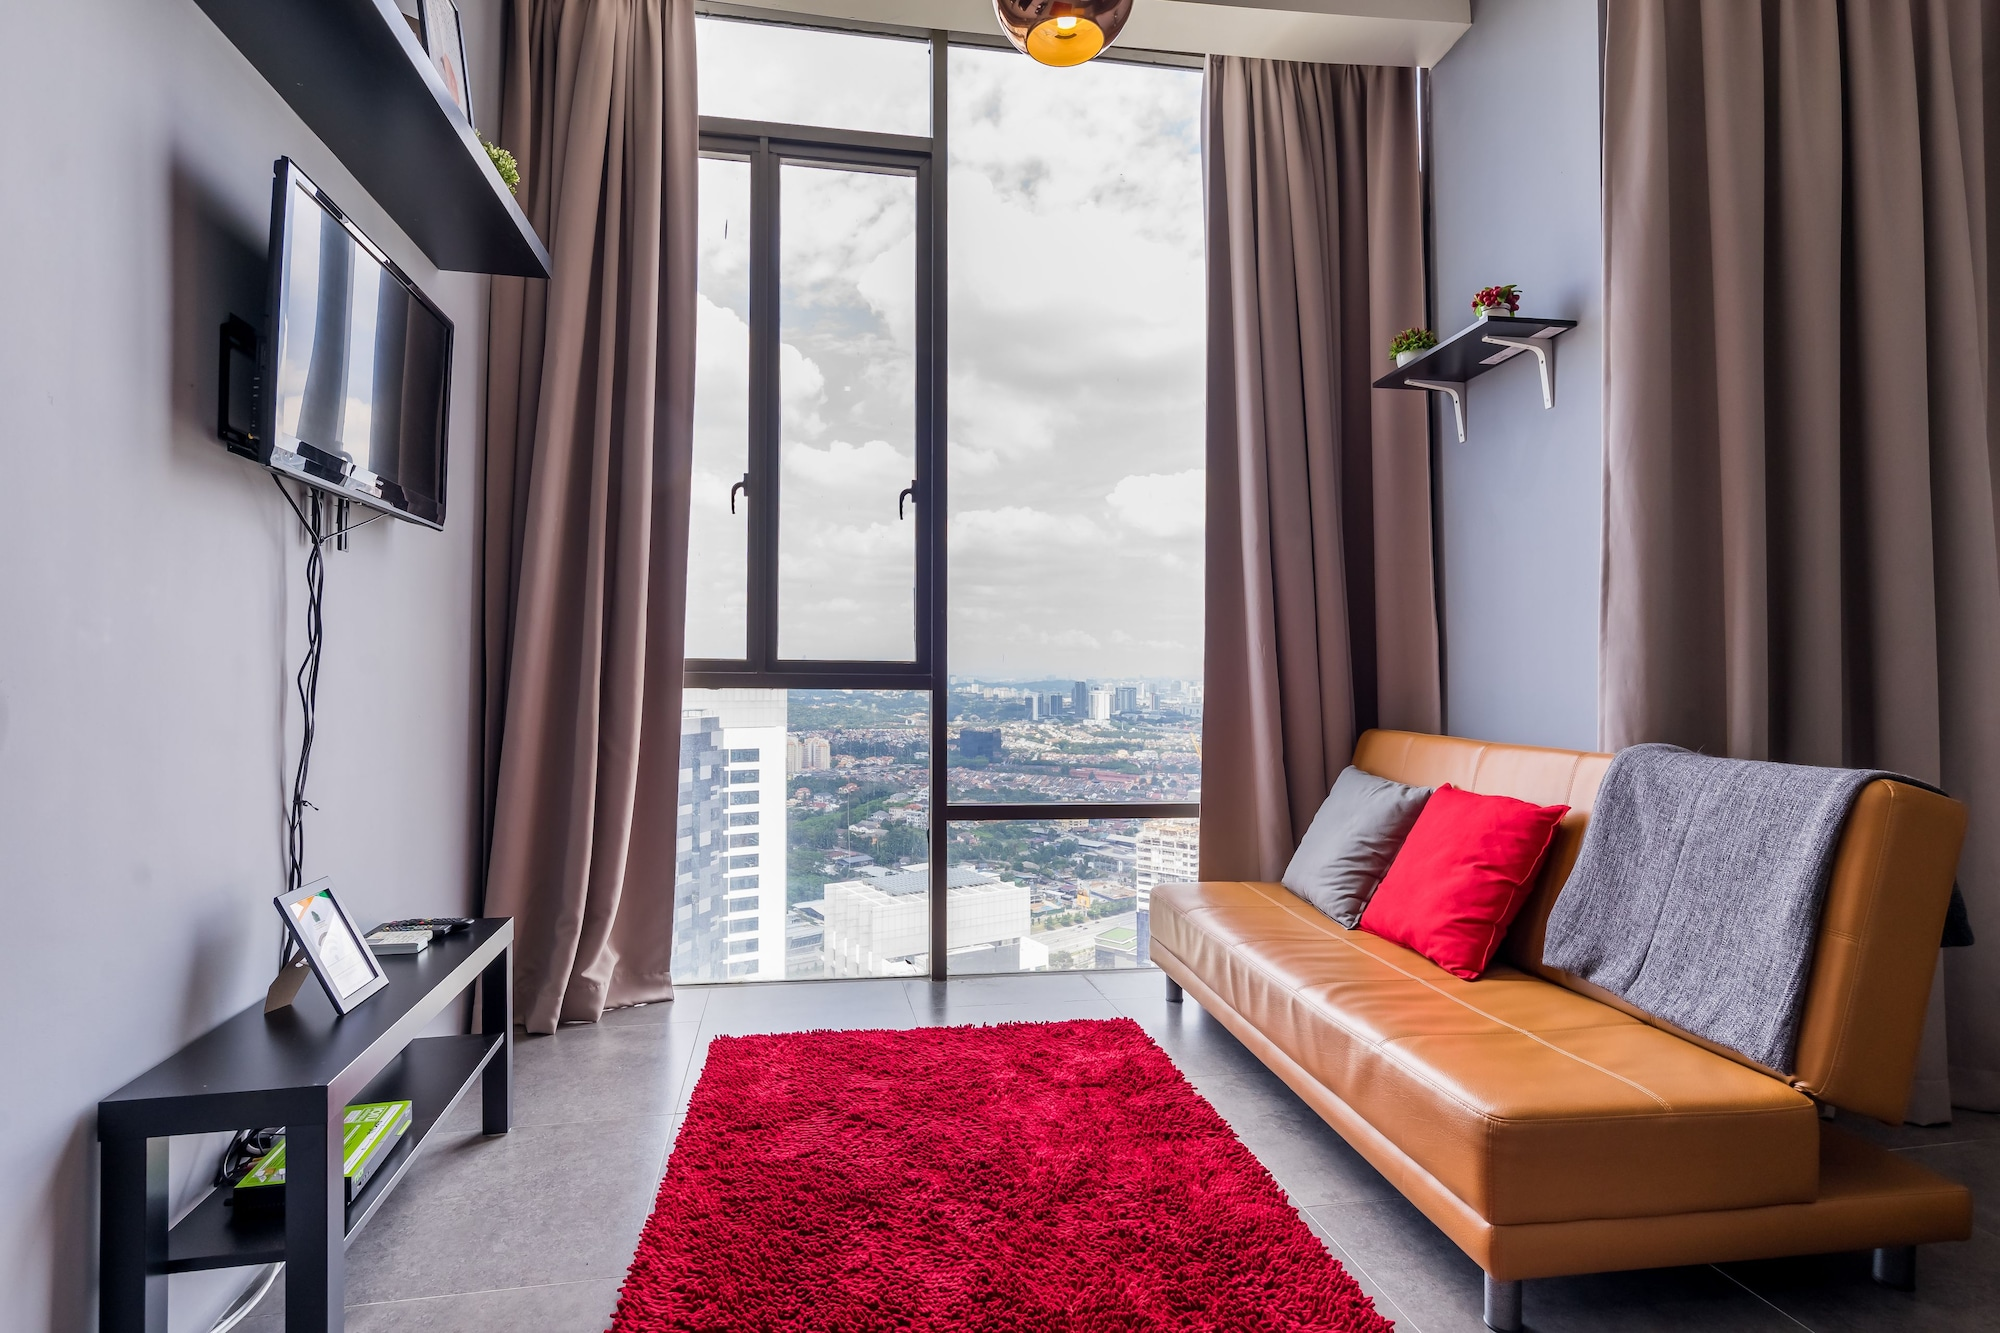 Proper Suites at Empire Damansara, Kuala Lumpur